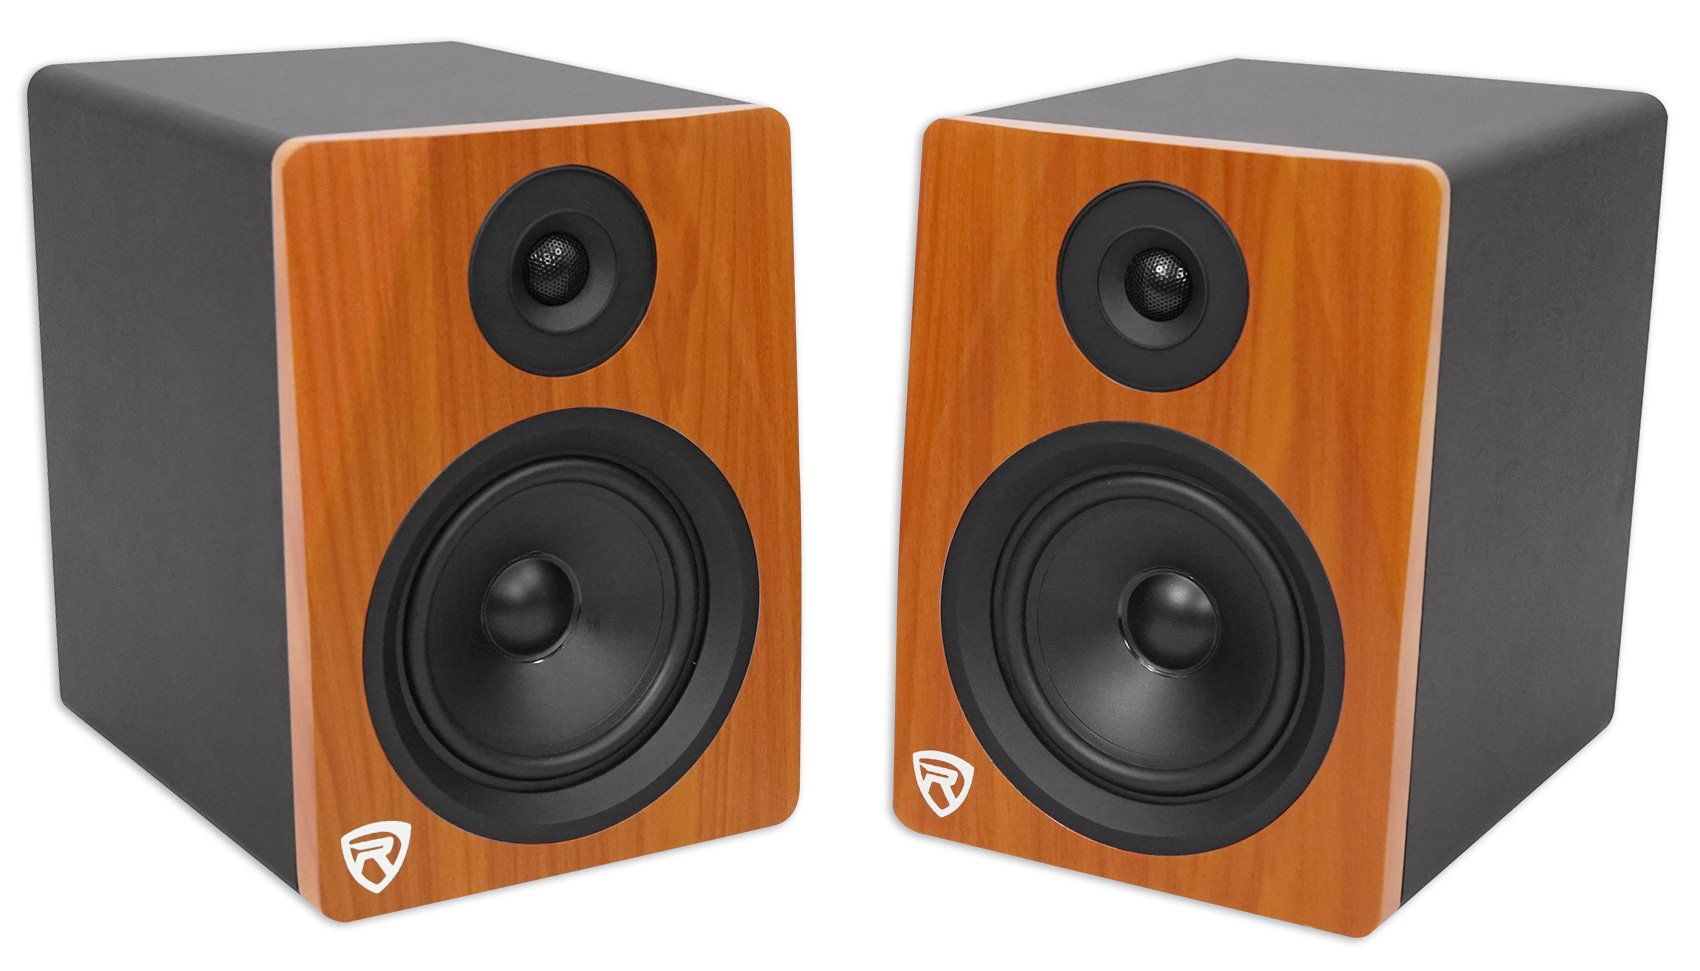 Pair of Rockville APM5C 5.25'' 2-Way 250 Watt Powered USB Studio Monitor Speakers in Classic Wood Finish